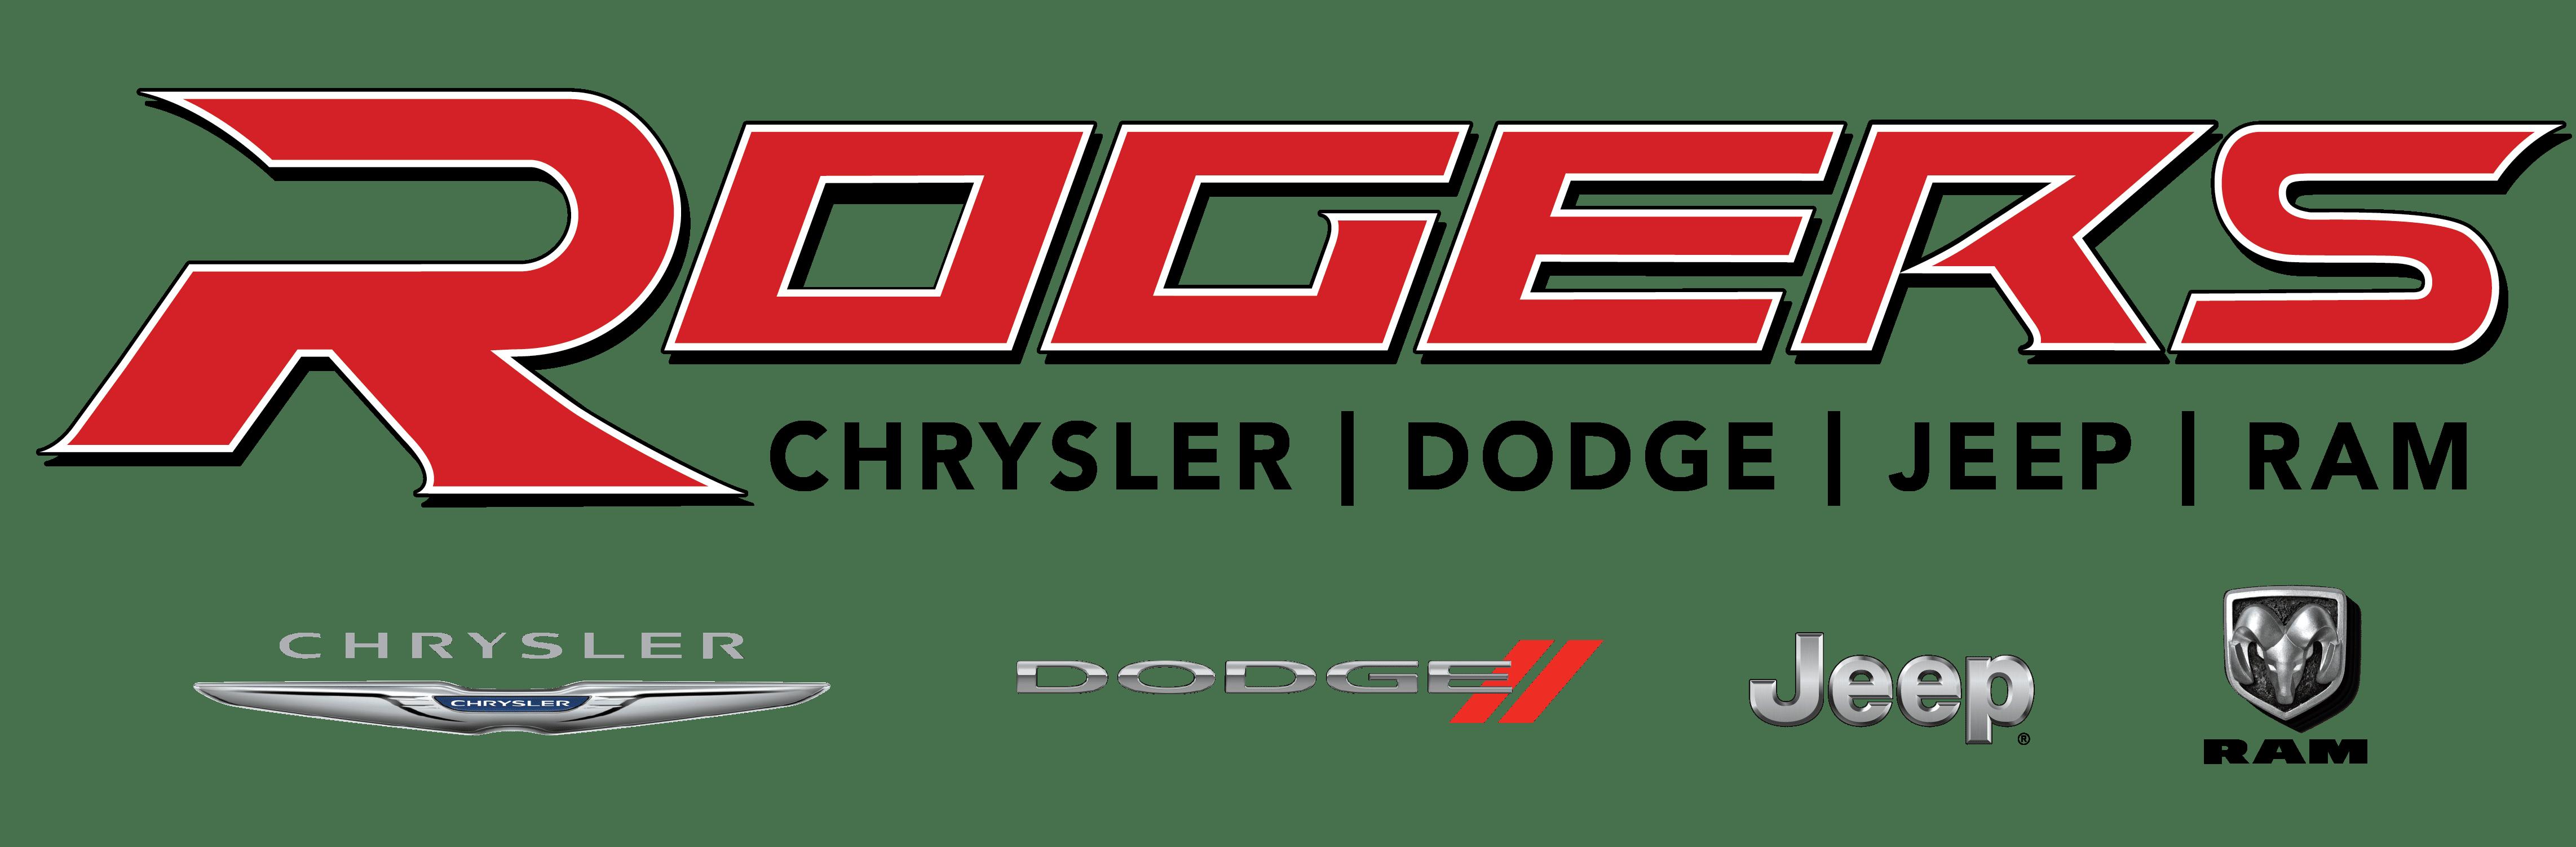 RM_rogers_logos_main-07 (003)